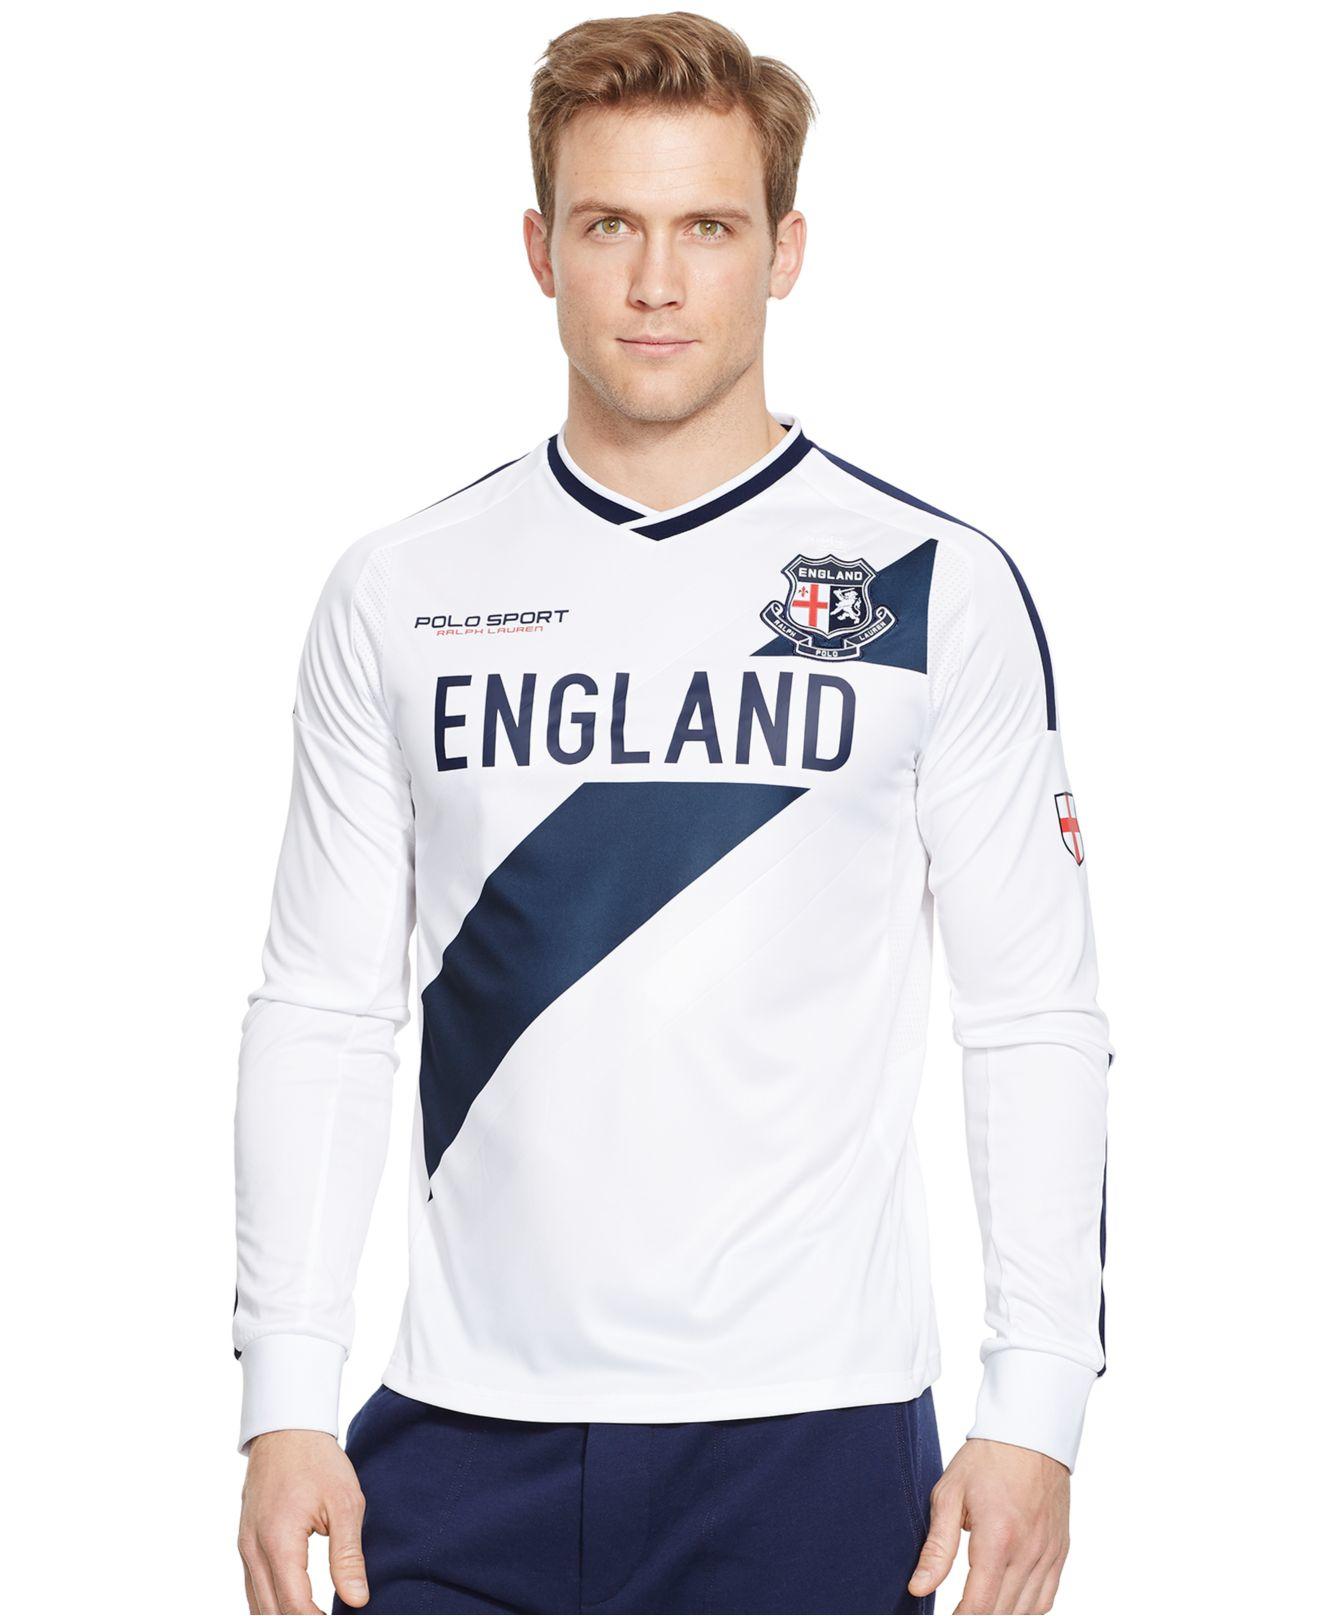 Polo ralph lauren polo sport england jersey t shirt in for Ralph lauren polo jersey shirt